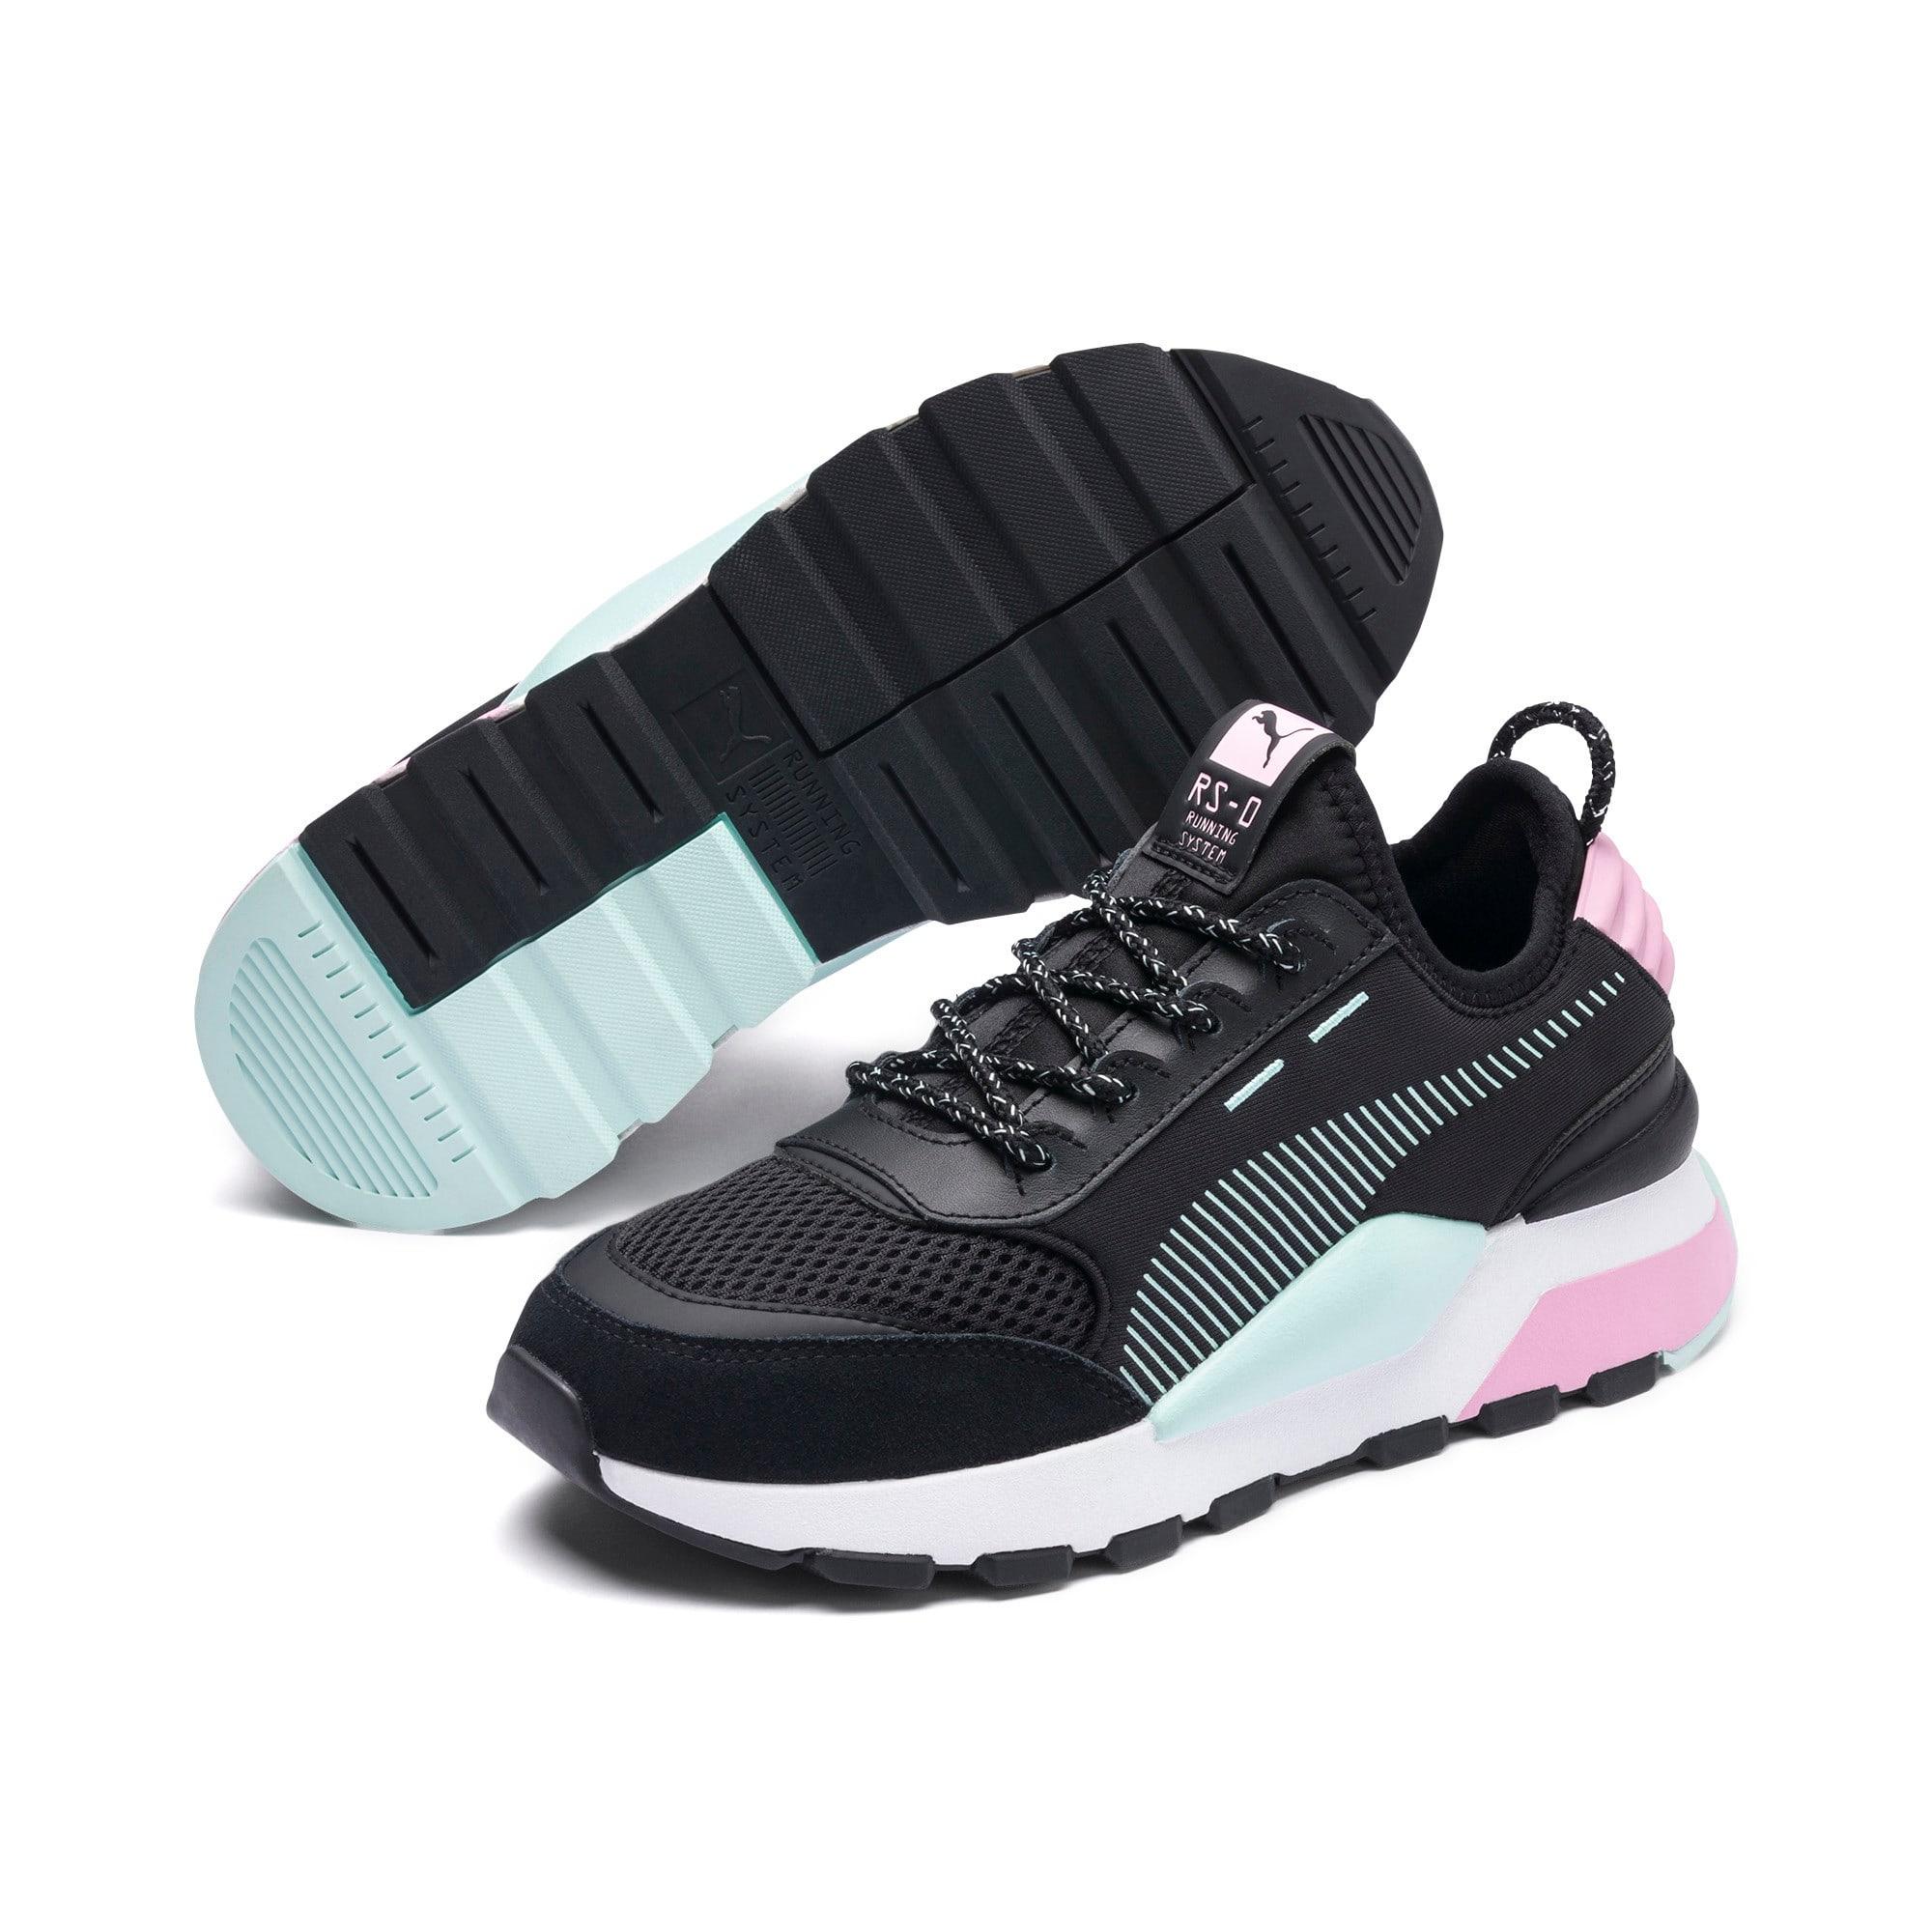 Thumbnail 2 of RS-0 Winter Inj Toys Sneakers JR, Puma Black-Pale Pink, medium